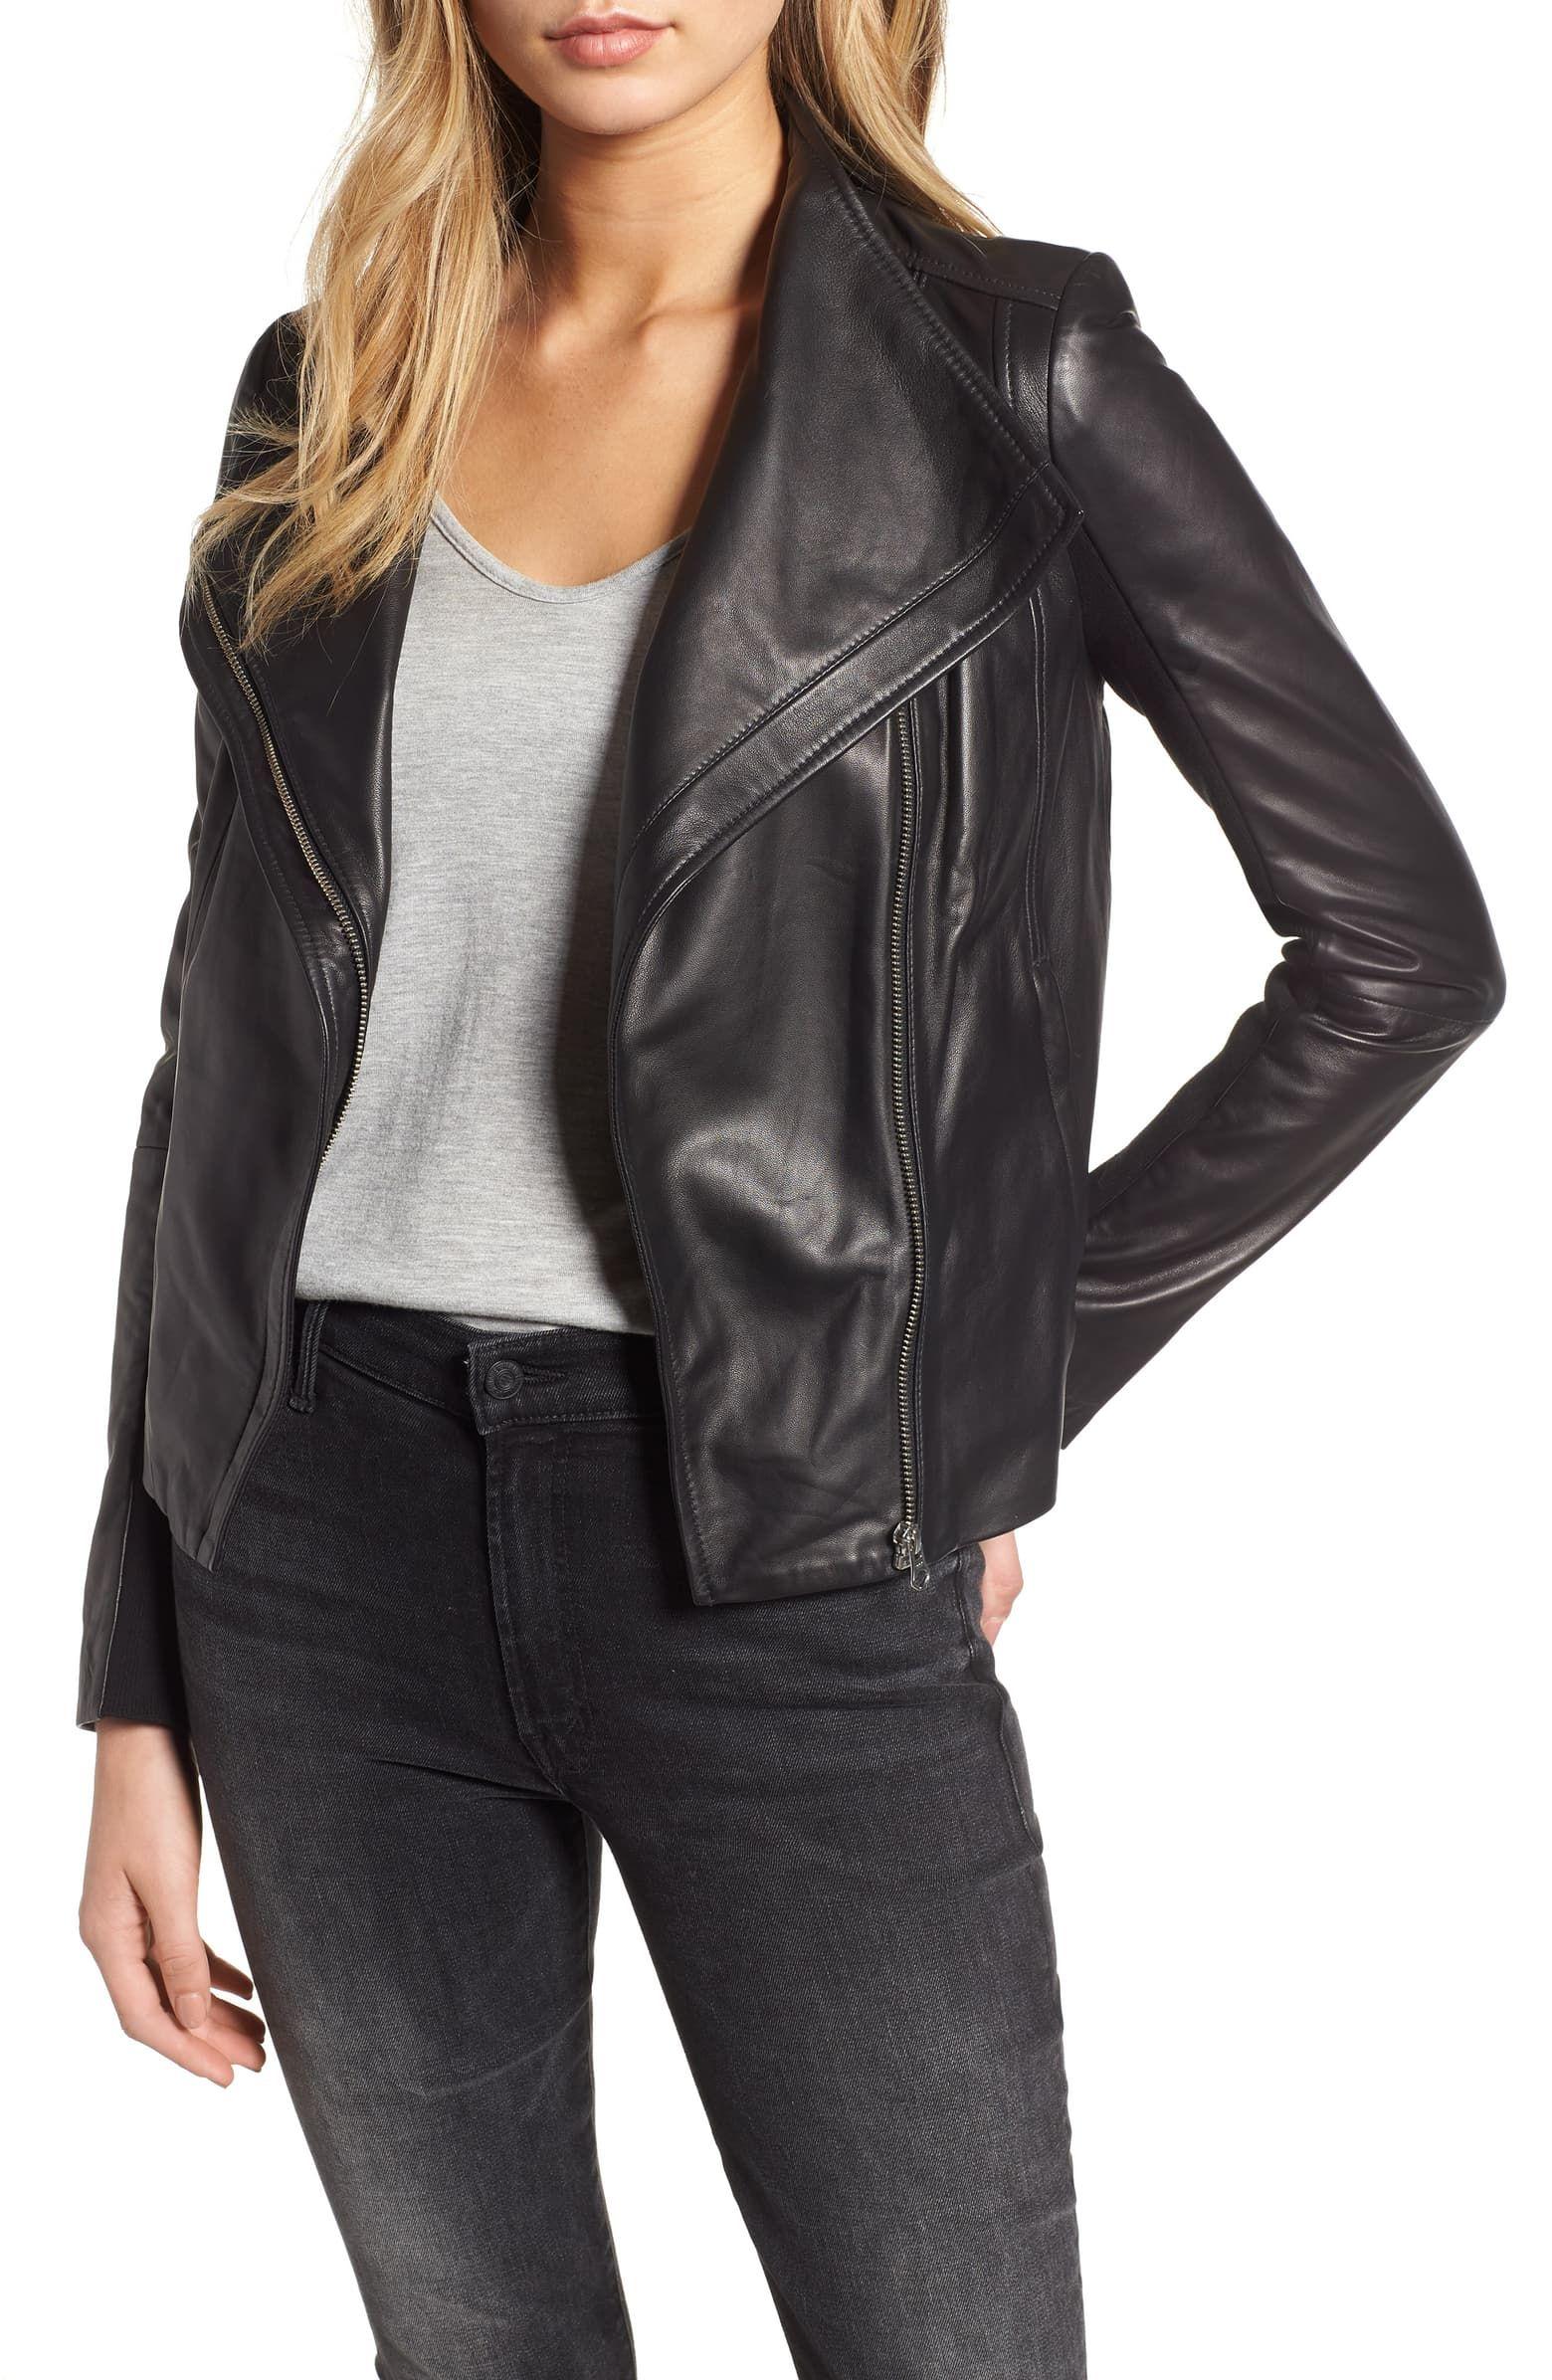 Chelsea28 Leather Moto Jacket Nordstrom Short Leather Jacket Leather Moto Jacket Nordstrom Jackets [ 2392 x 1560 Pixel ]